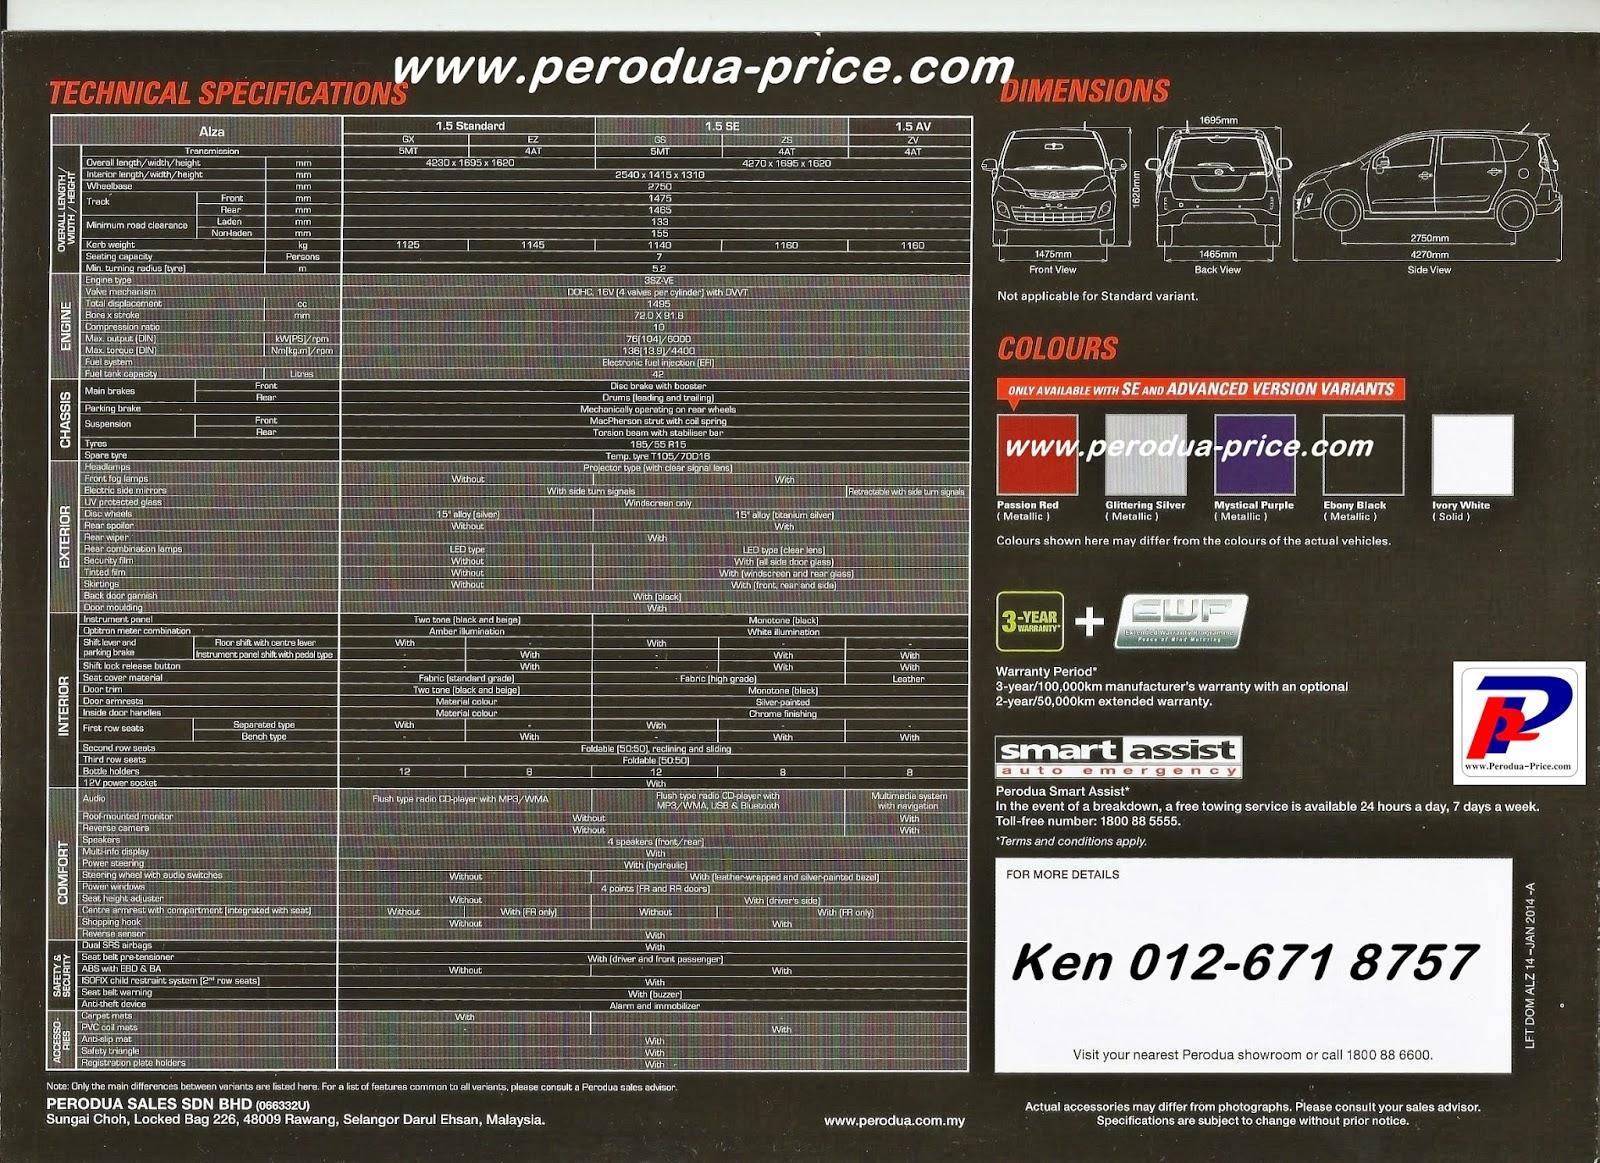 Perodua Promotion - Call 012-671 8757: New Perodua Alza